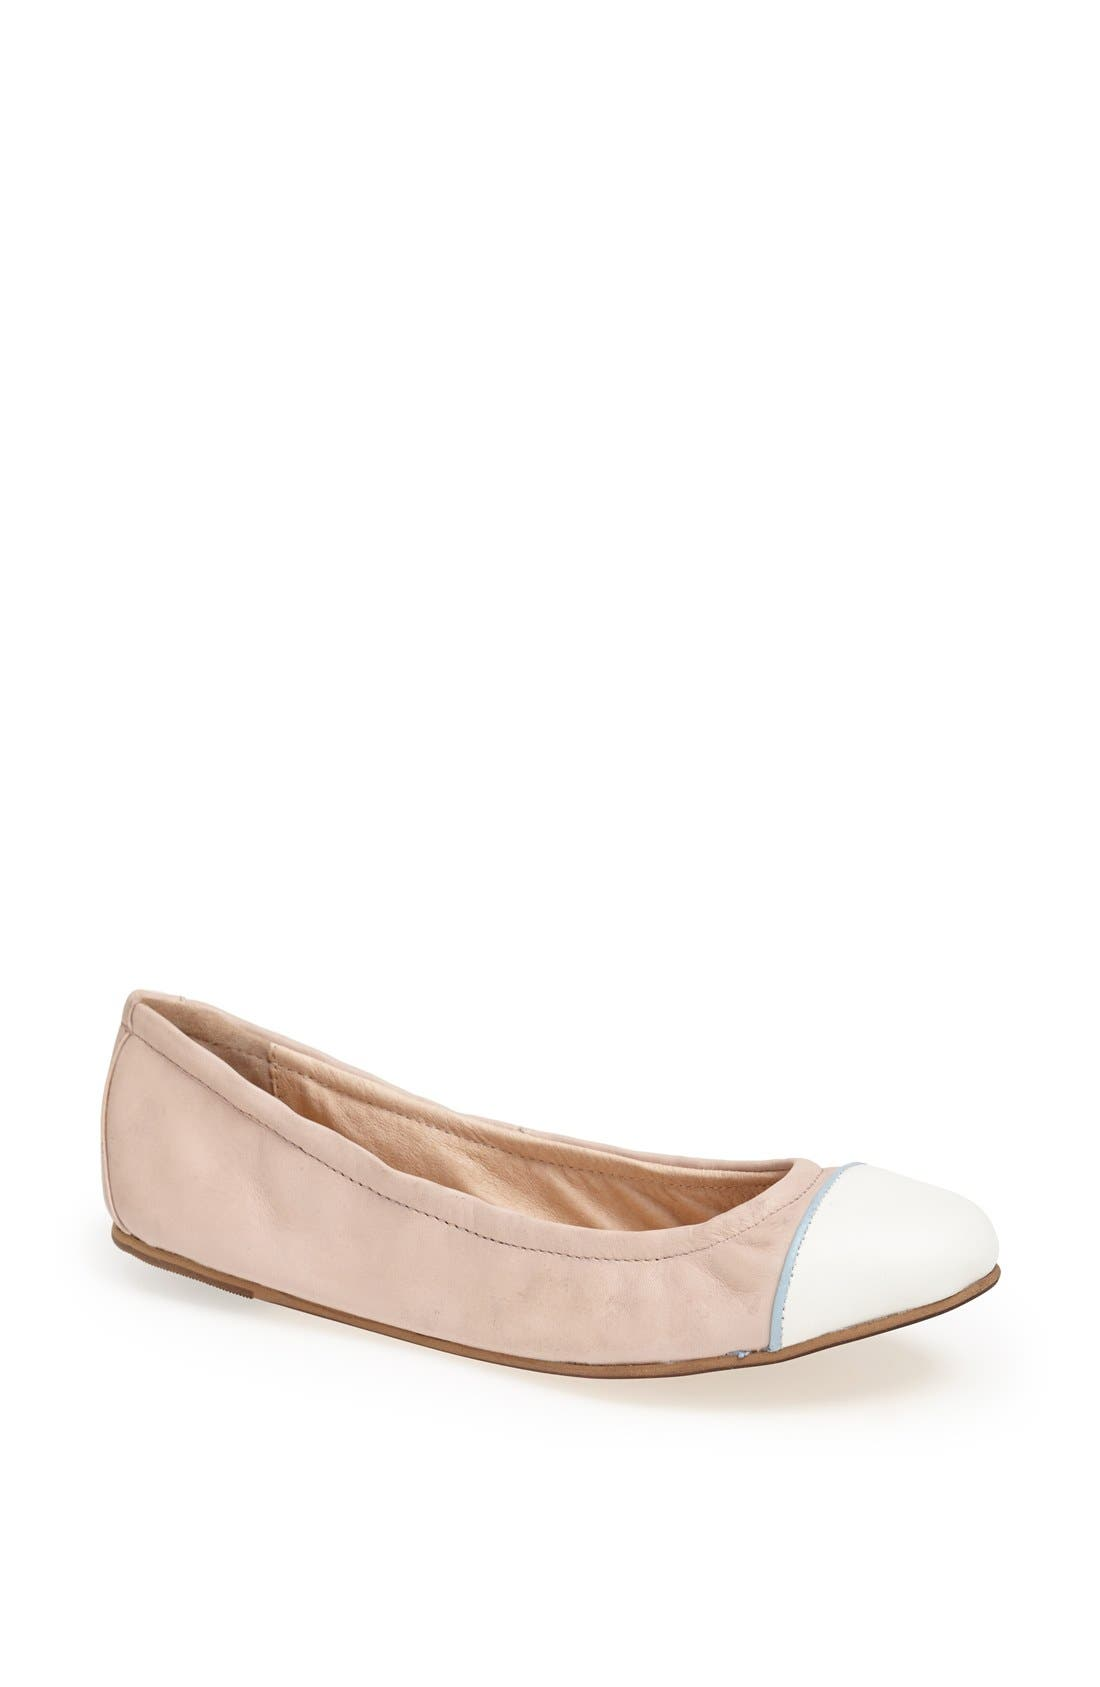 Main Image - Yosi Samra 'Marni' Foldable Ballet Flat